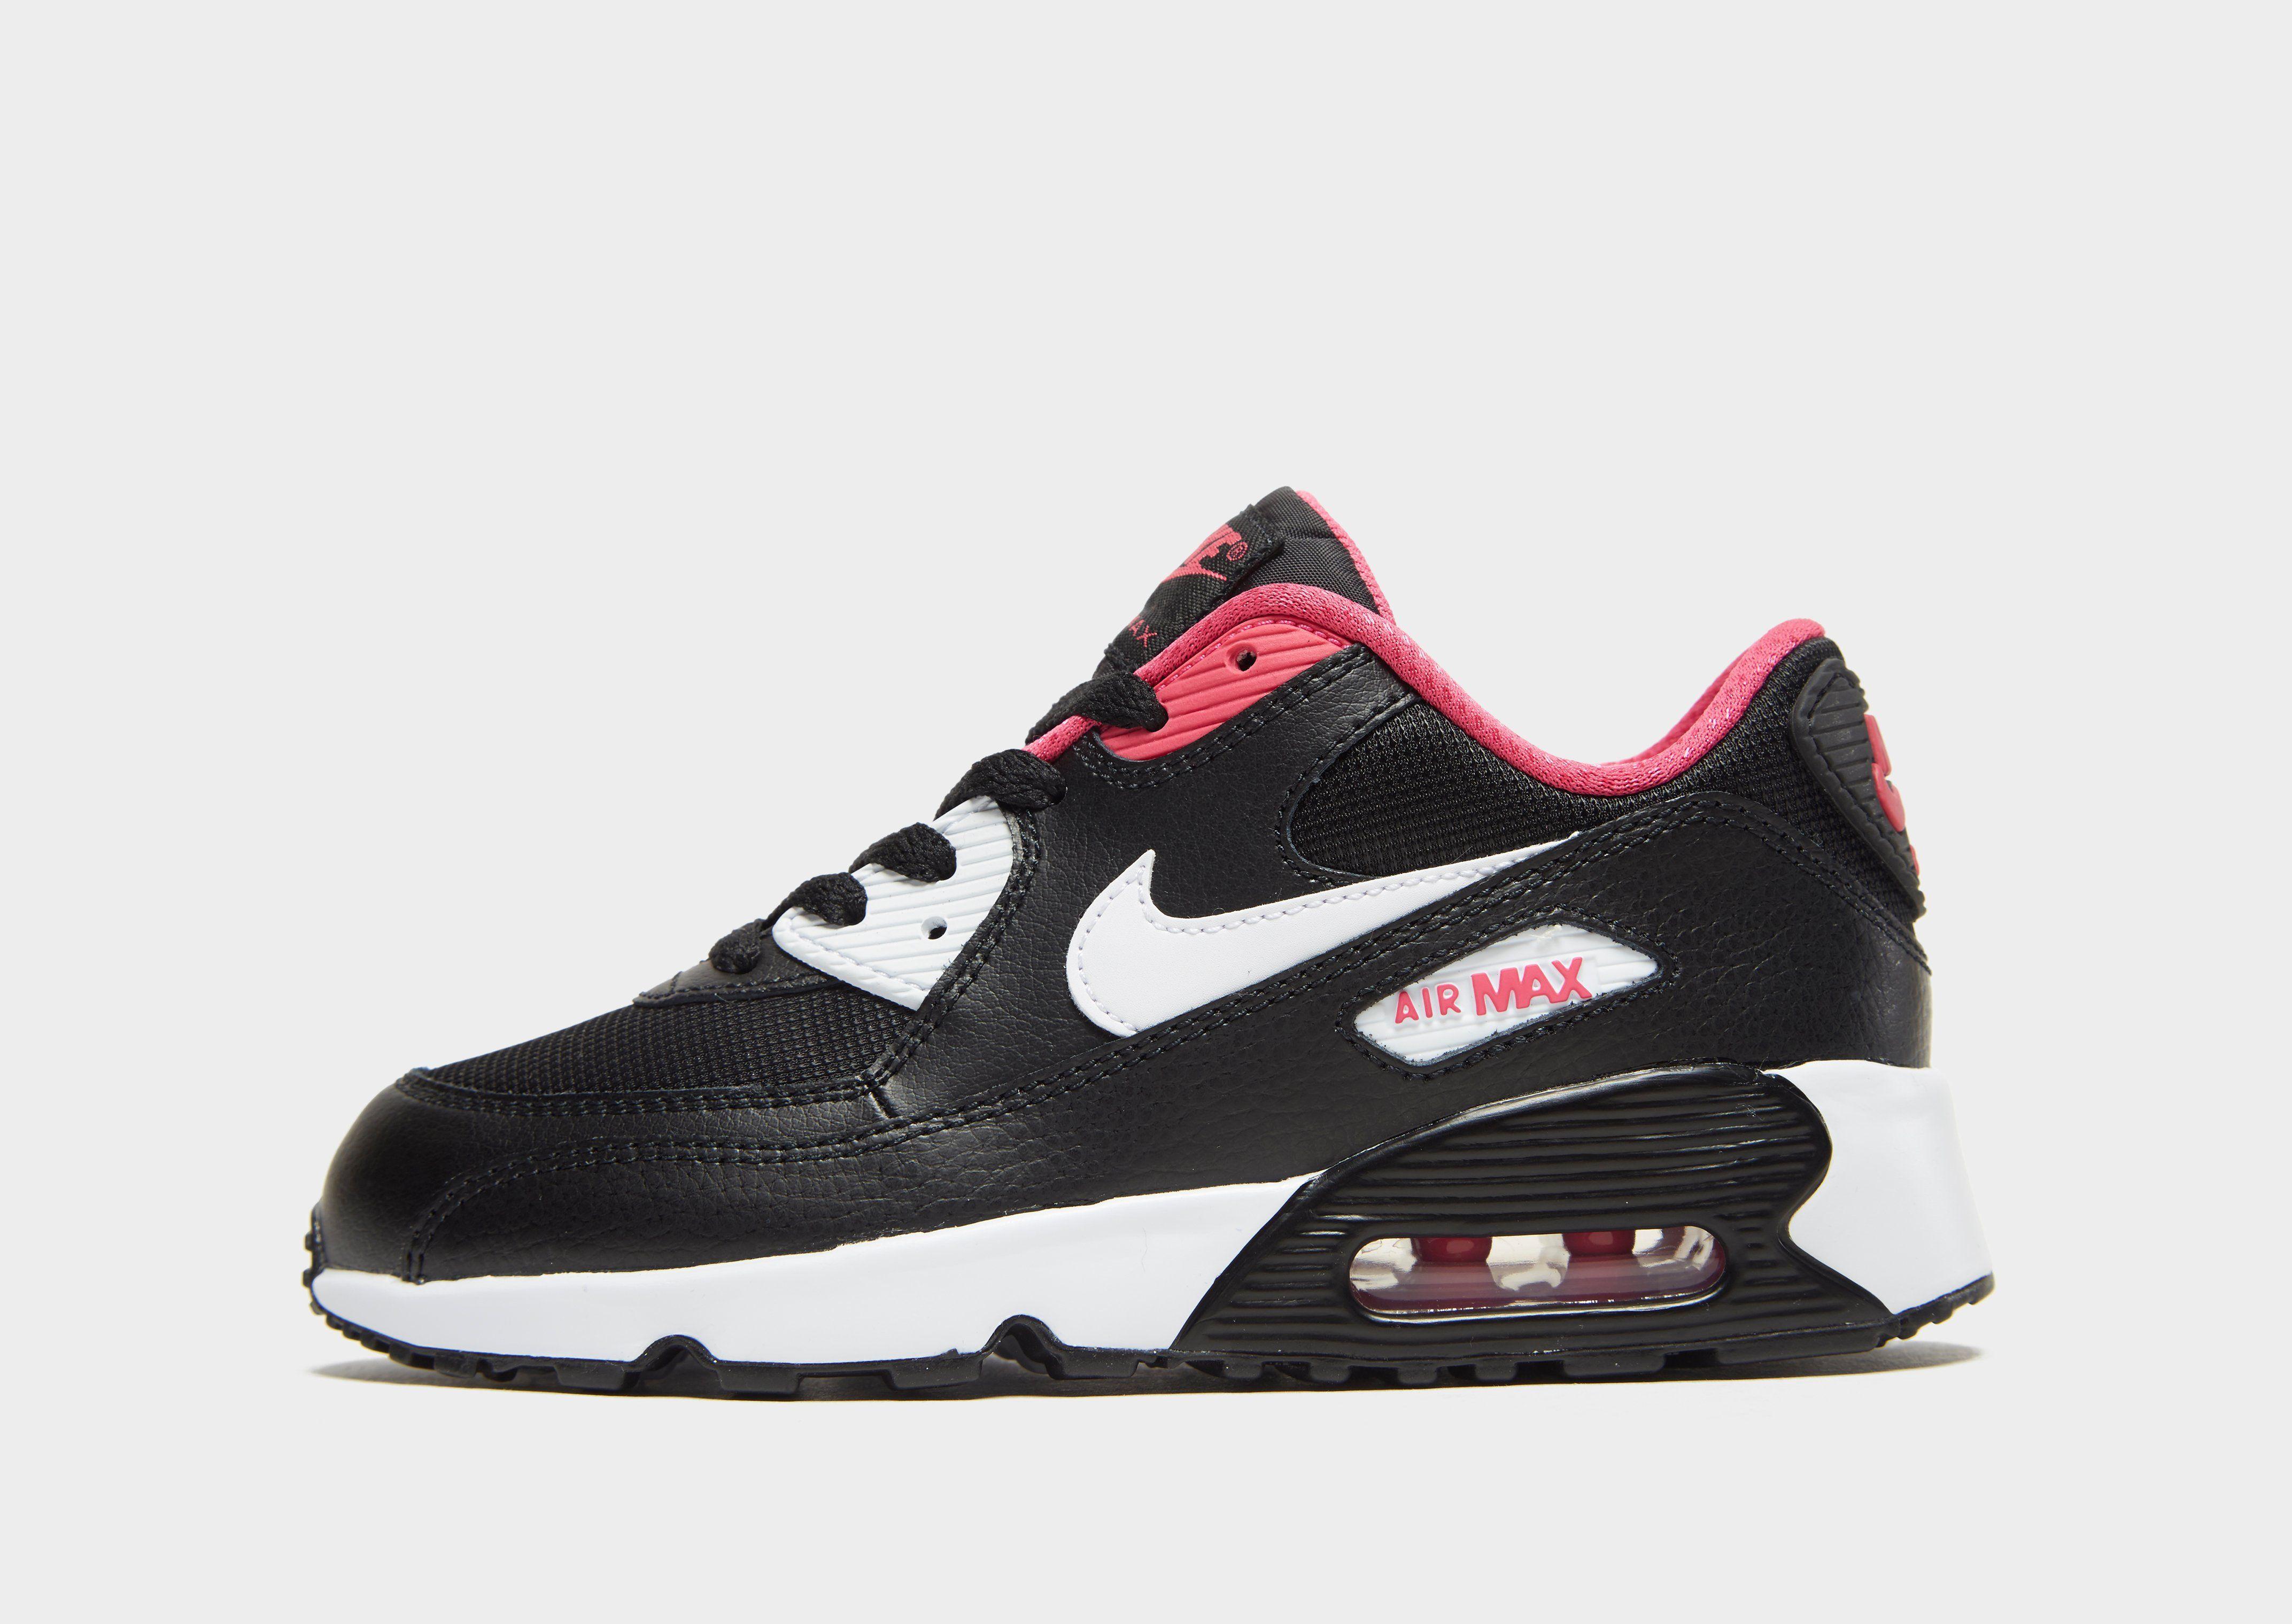 huge discount 46474 4e7e6 Nike Air Max 90 Children   JD Sports Ireland